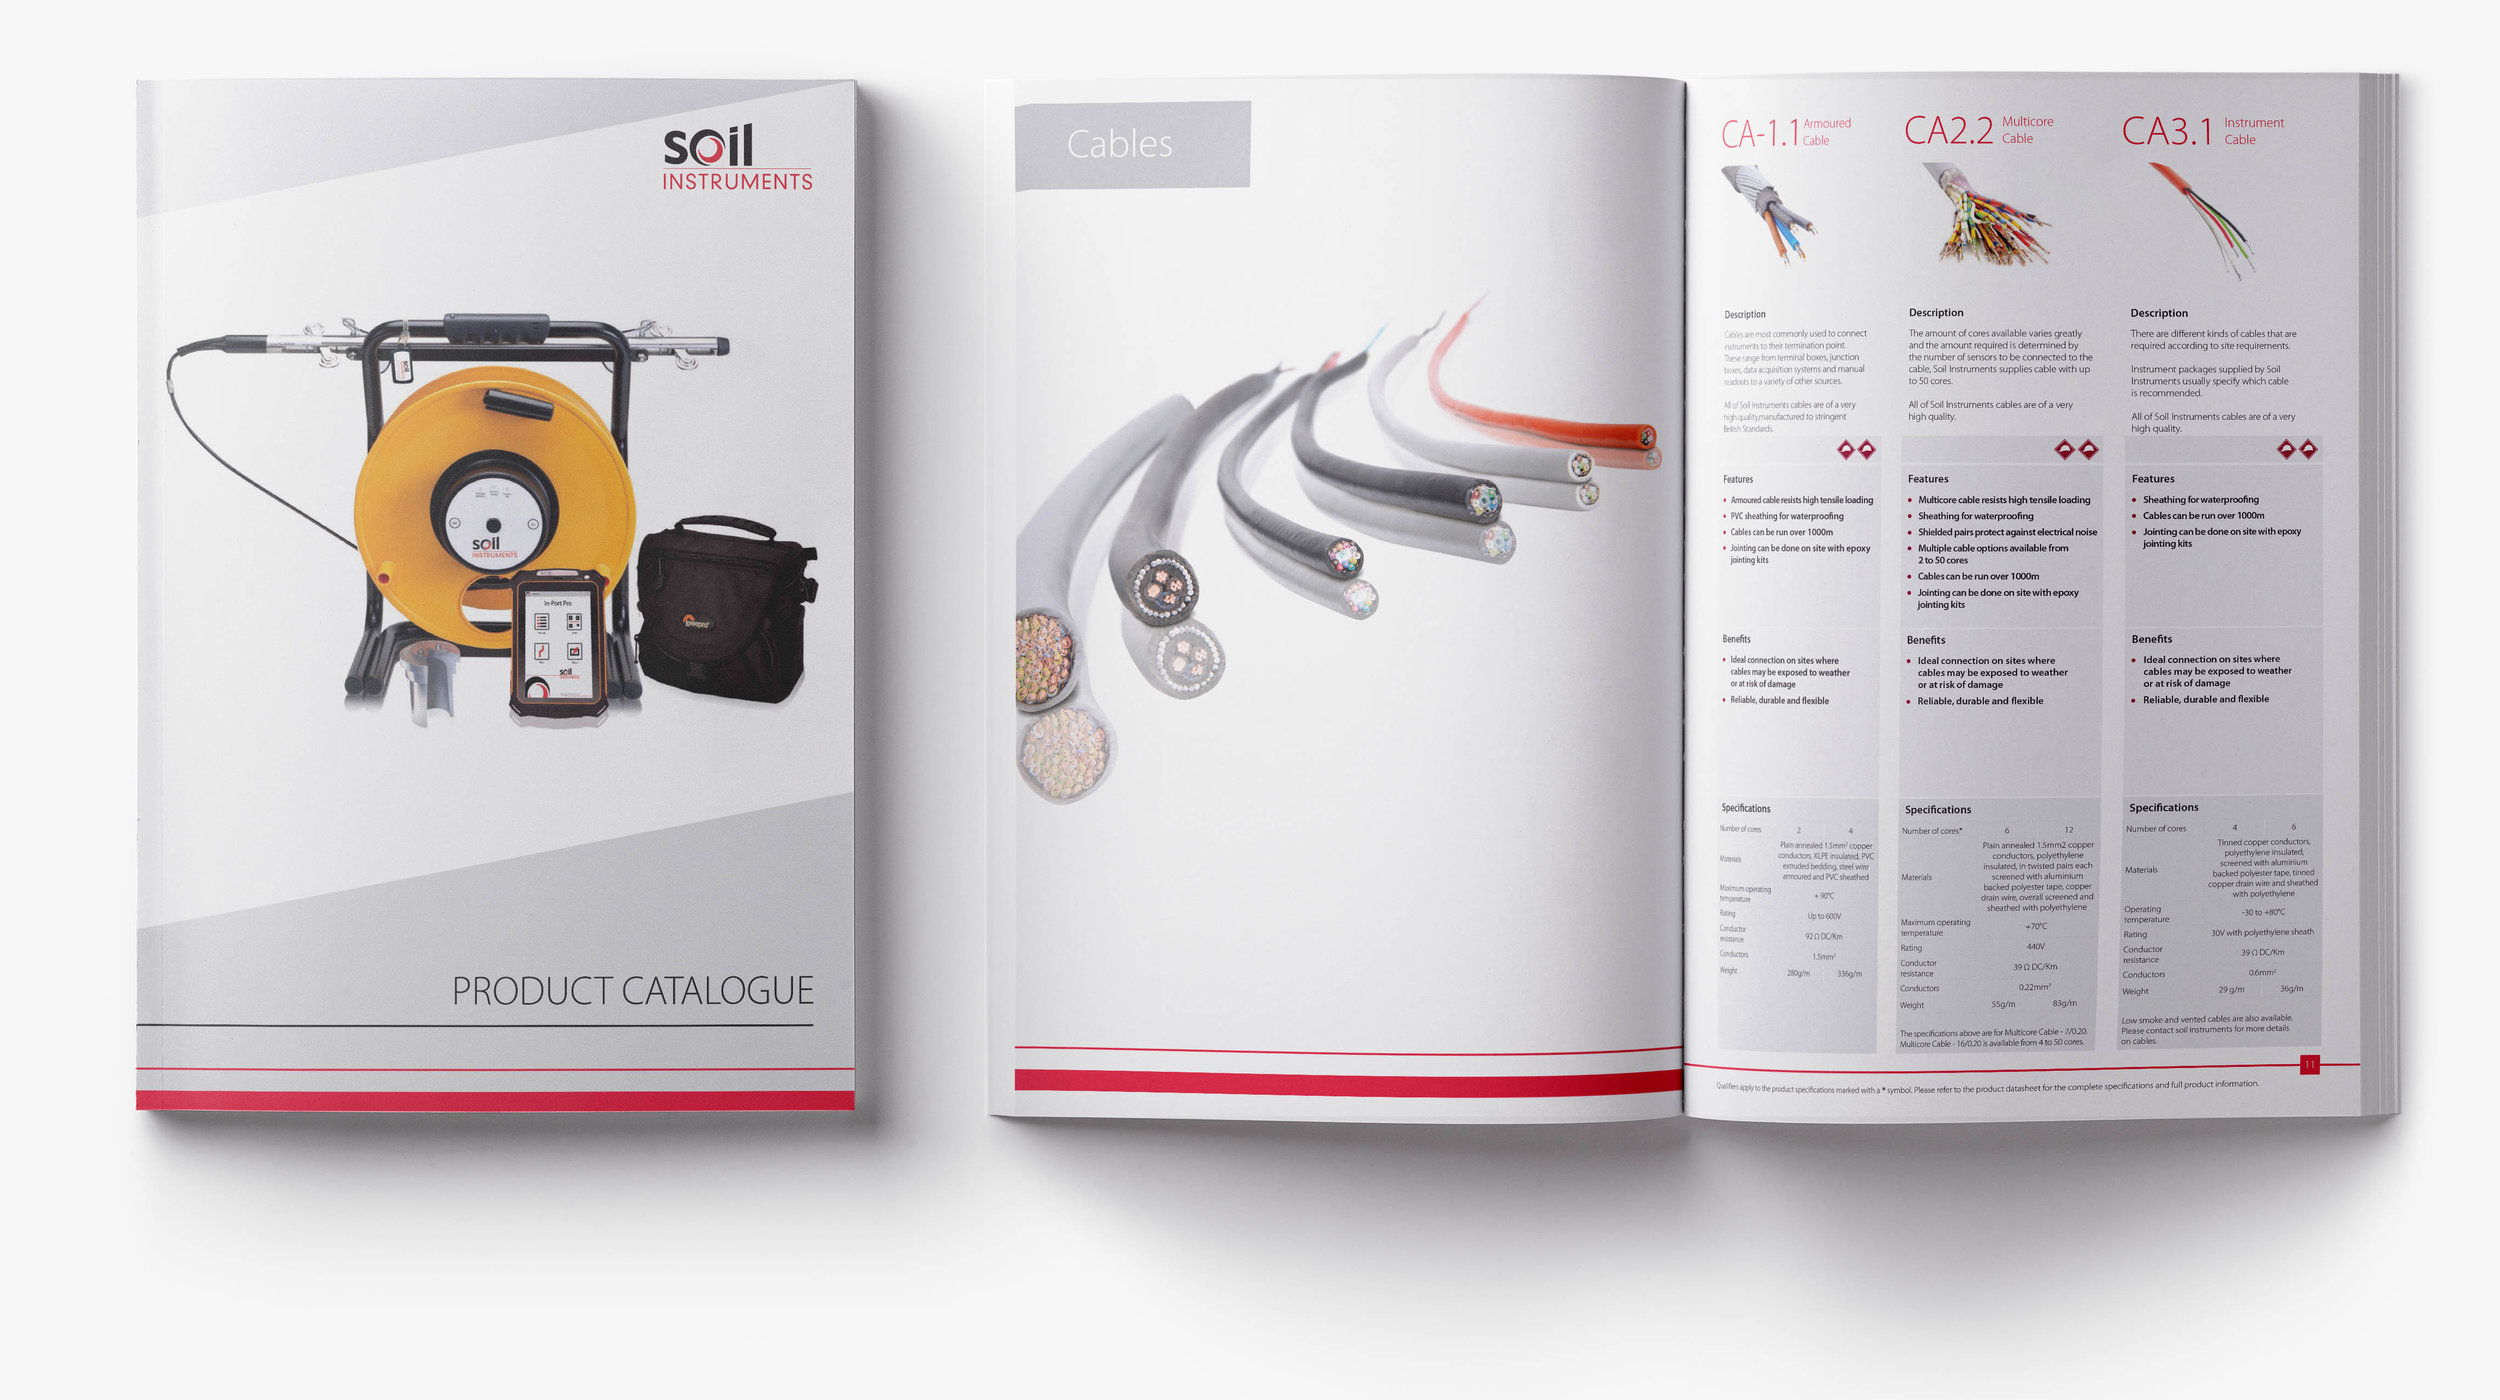 Soil_Product_Catalogue copy.jpg